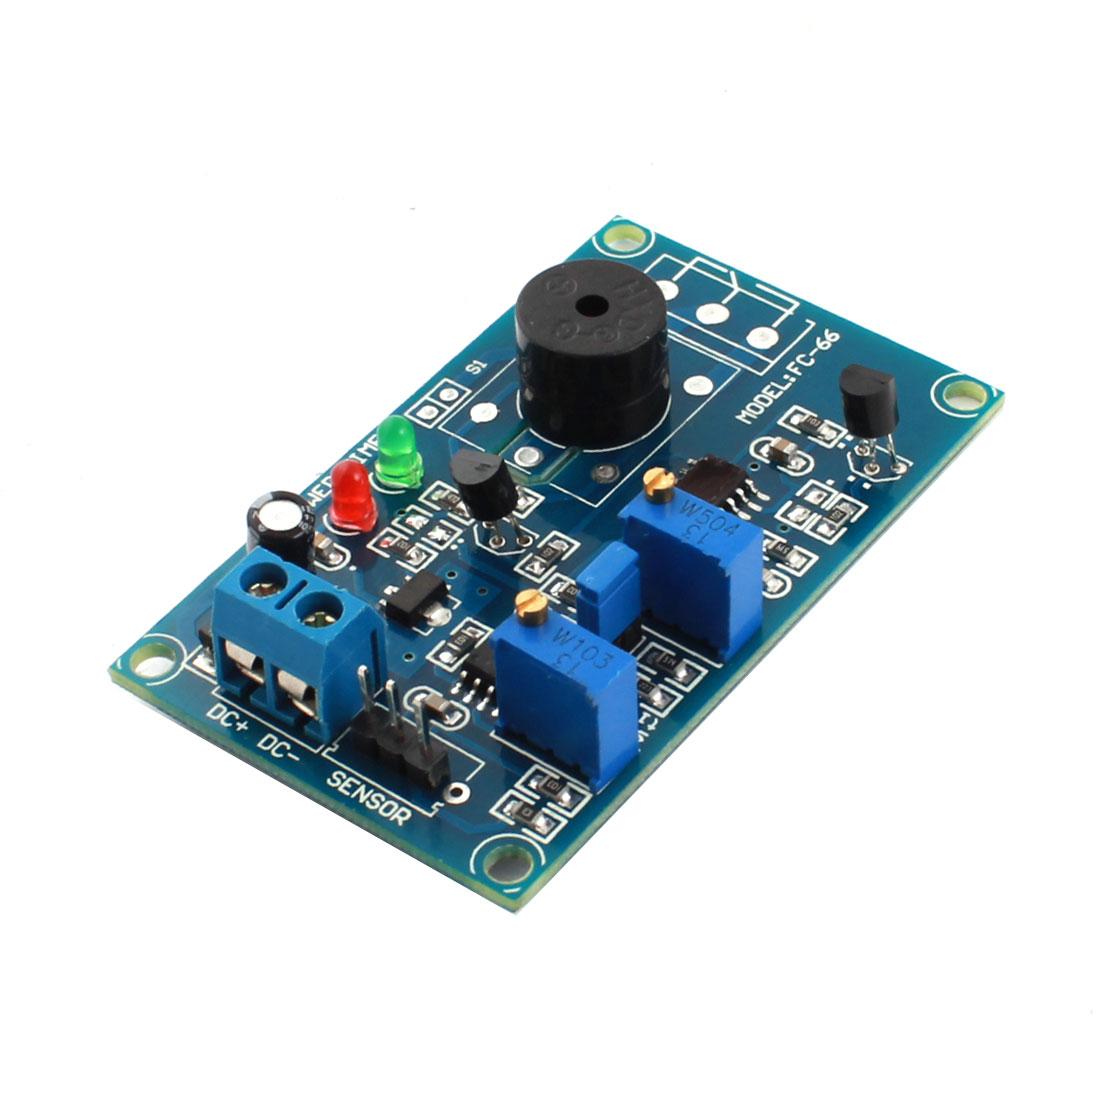 FC-66 DC 12V 0-60cm 0-20S Sensor Time Buzzer Alarm Delay Infrared Circuit Module Blue